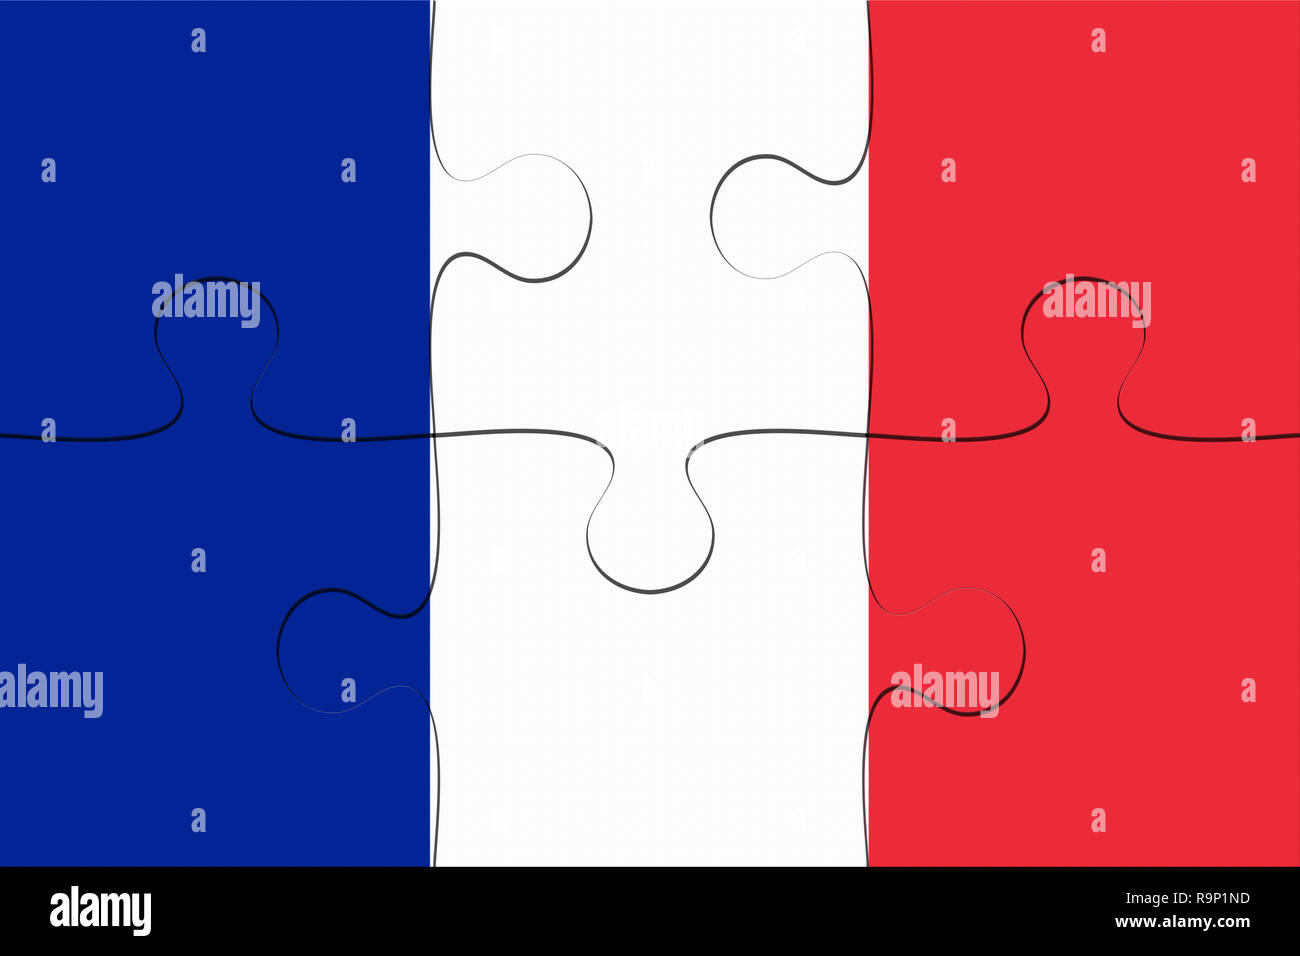 France Flag Jigsaw Puzzle, 3d illustration background - Stock Image